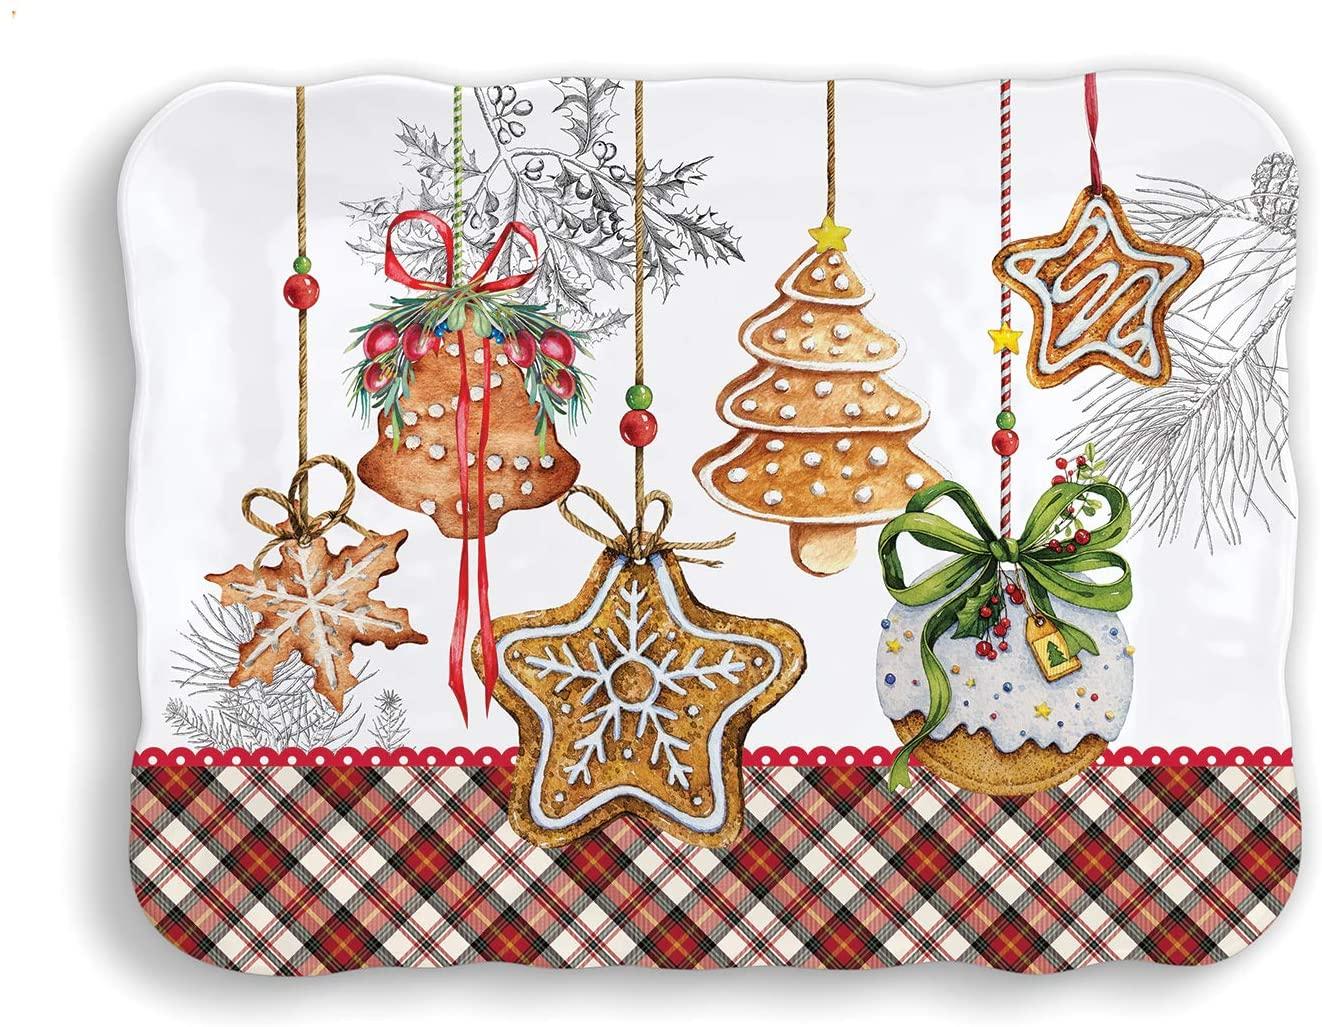 Michel Design Works Melamine Serveware Cookie Tray, Holiday Treats